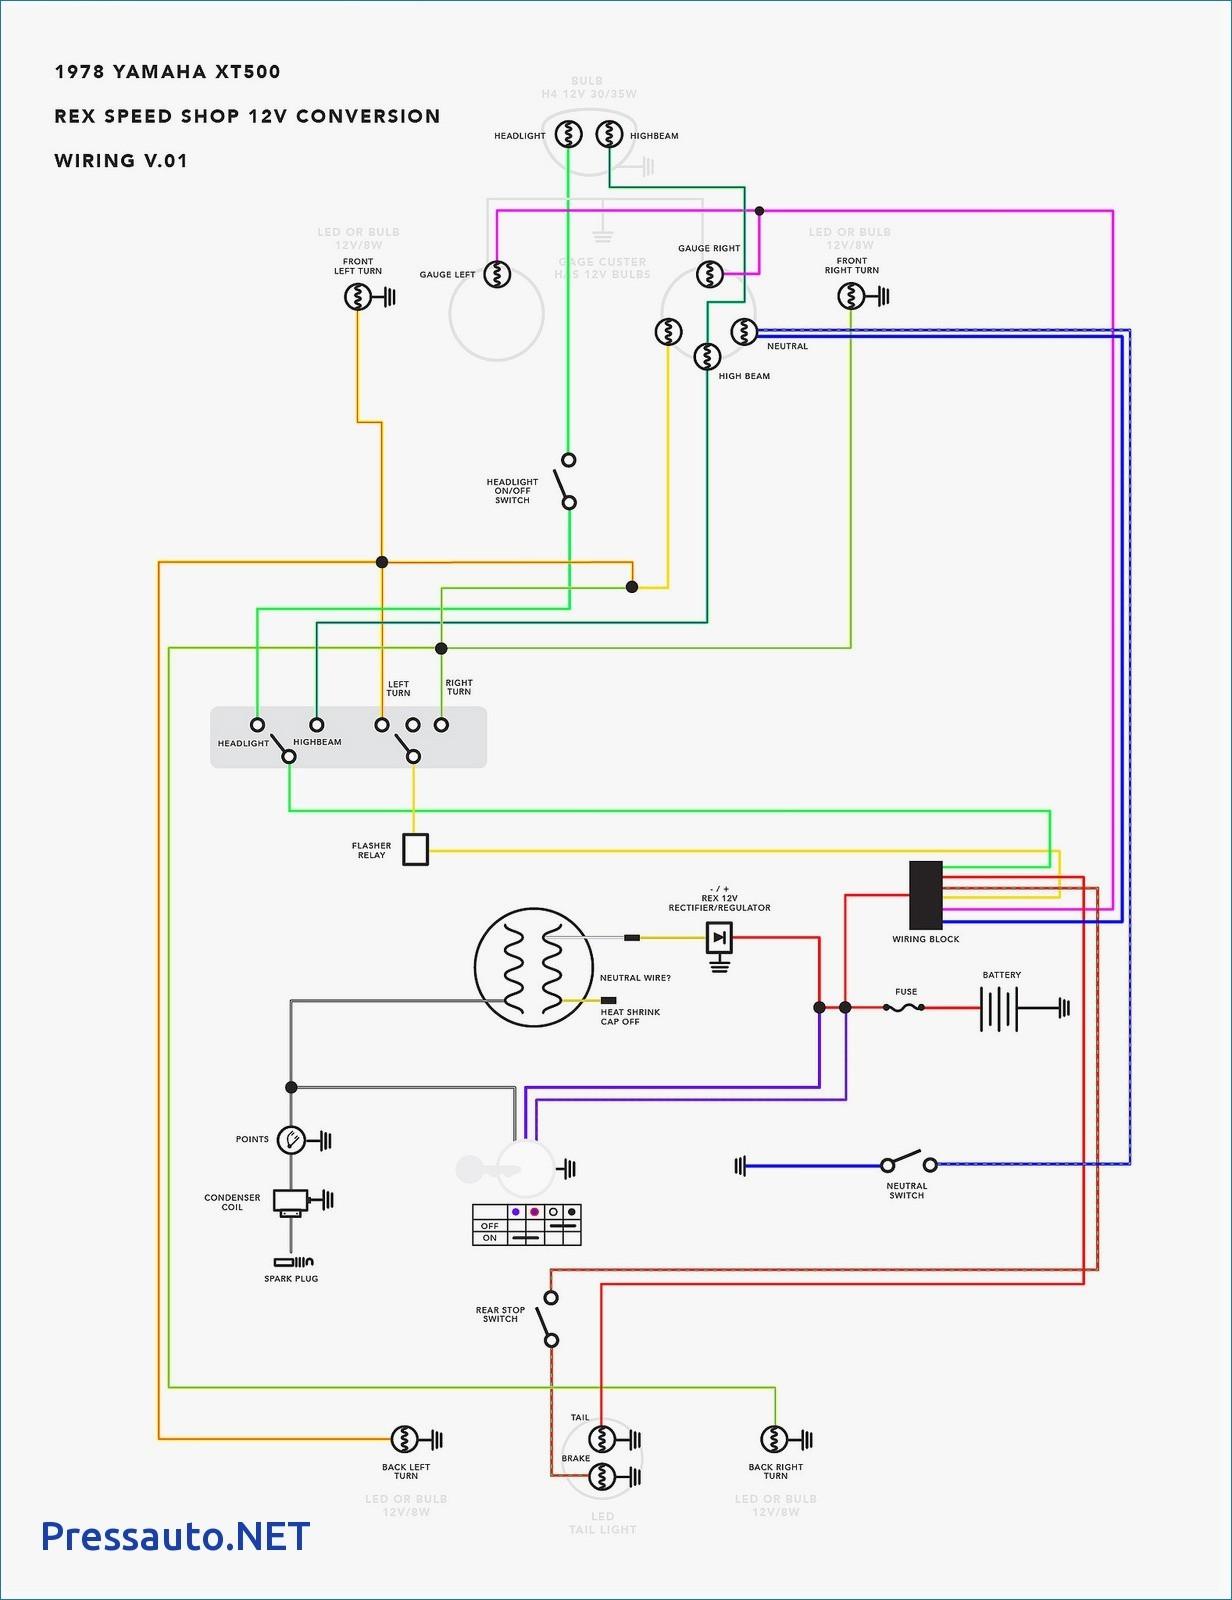 Farmall 826 Wiring Diagram - Wiring Diagrams Hidden on